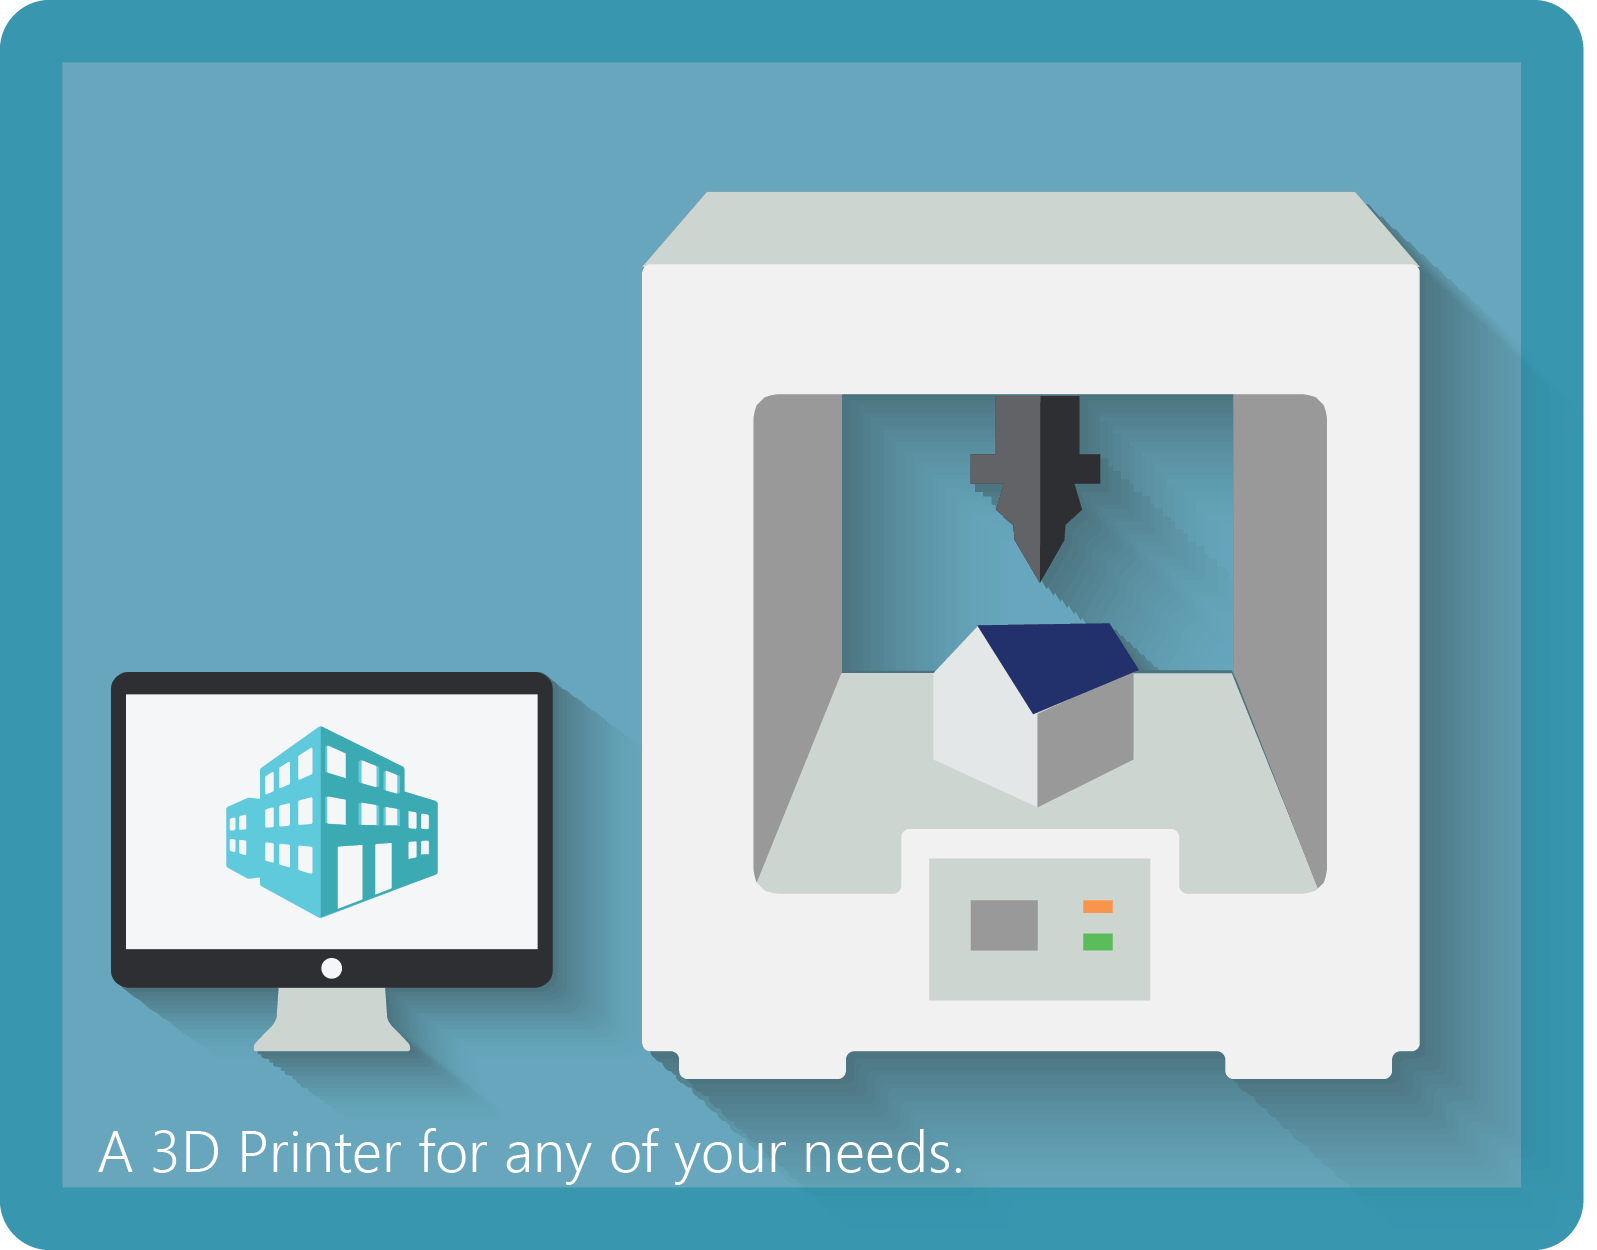 3D Printer 3D Printing Shop